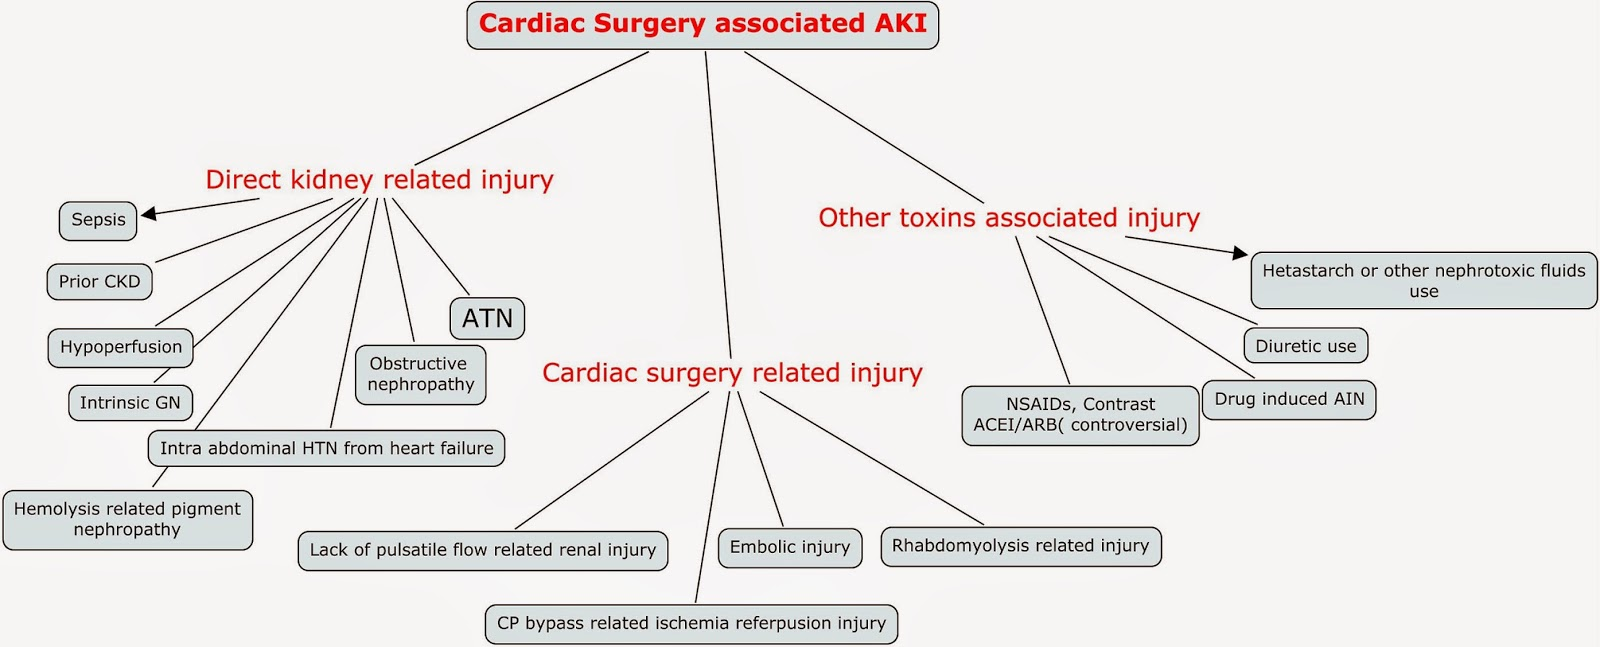 Nephron power concept map cardiac surgery associated acute kidney concept map cardiac surgery associated acute kidney injury ccuart Choice Image